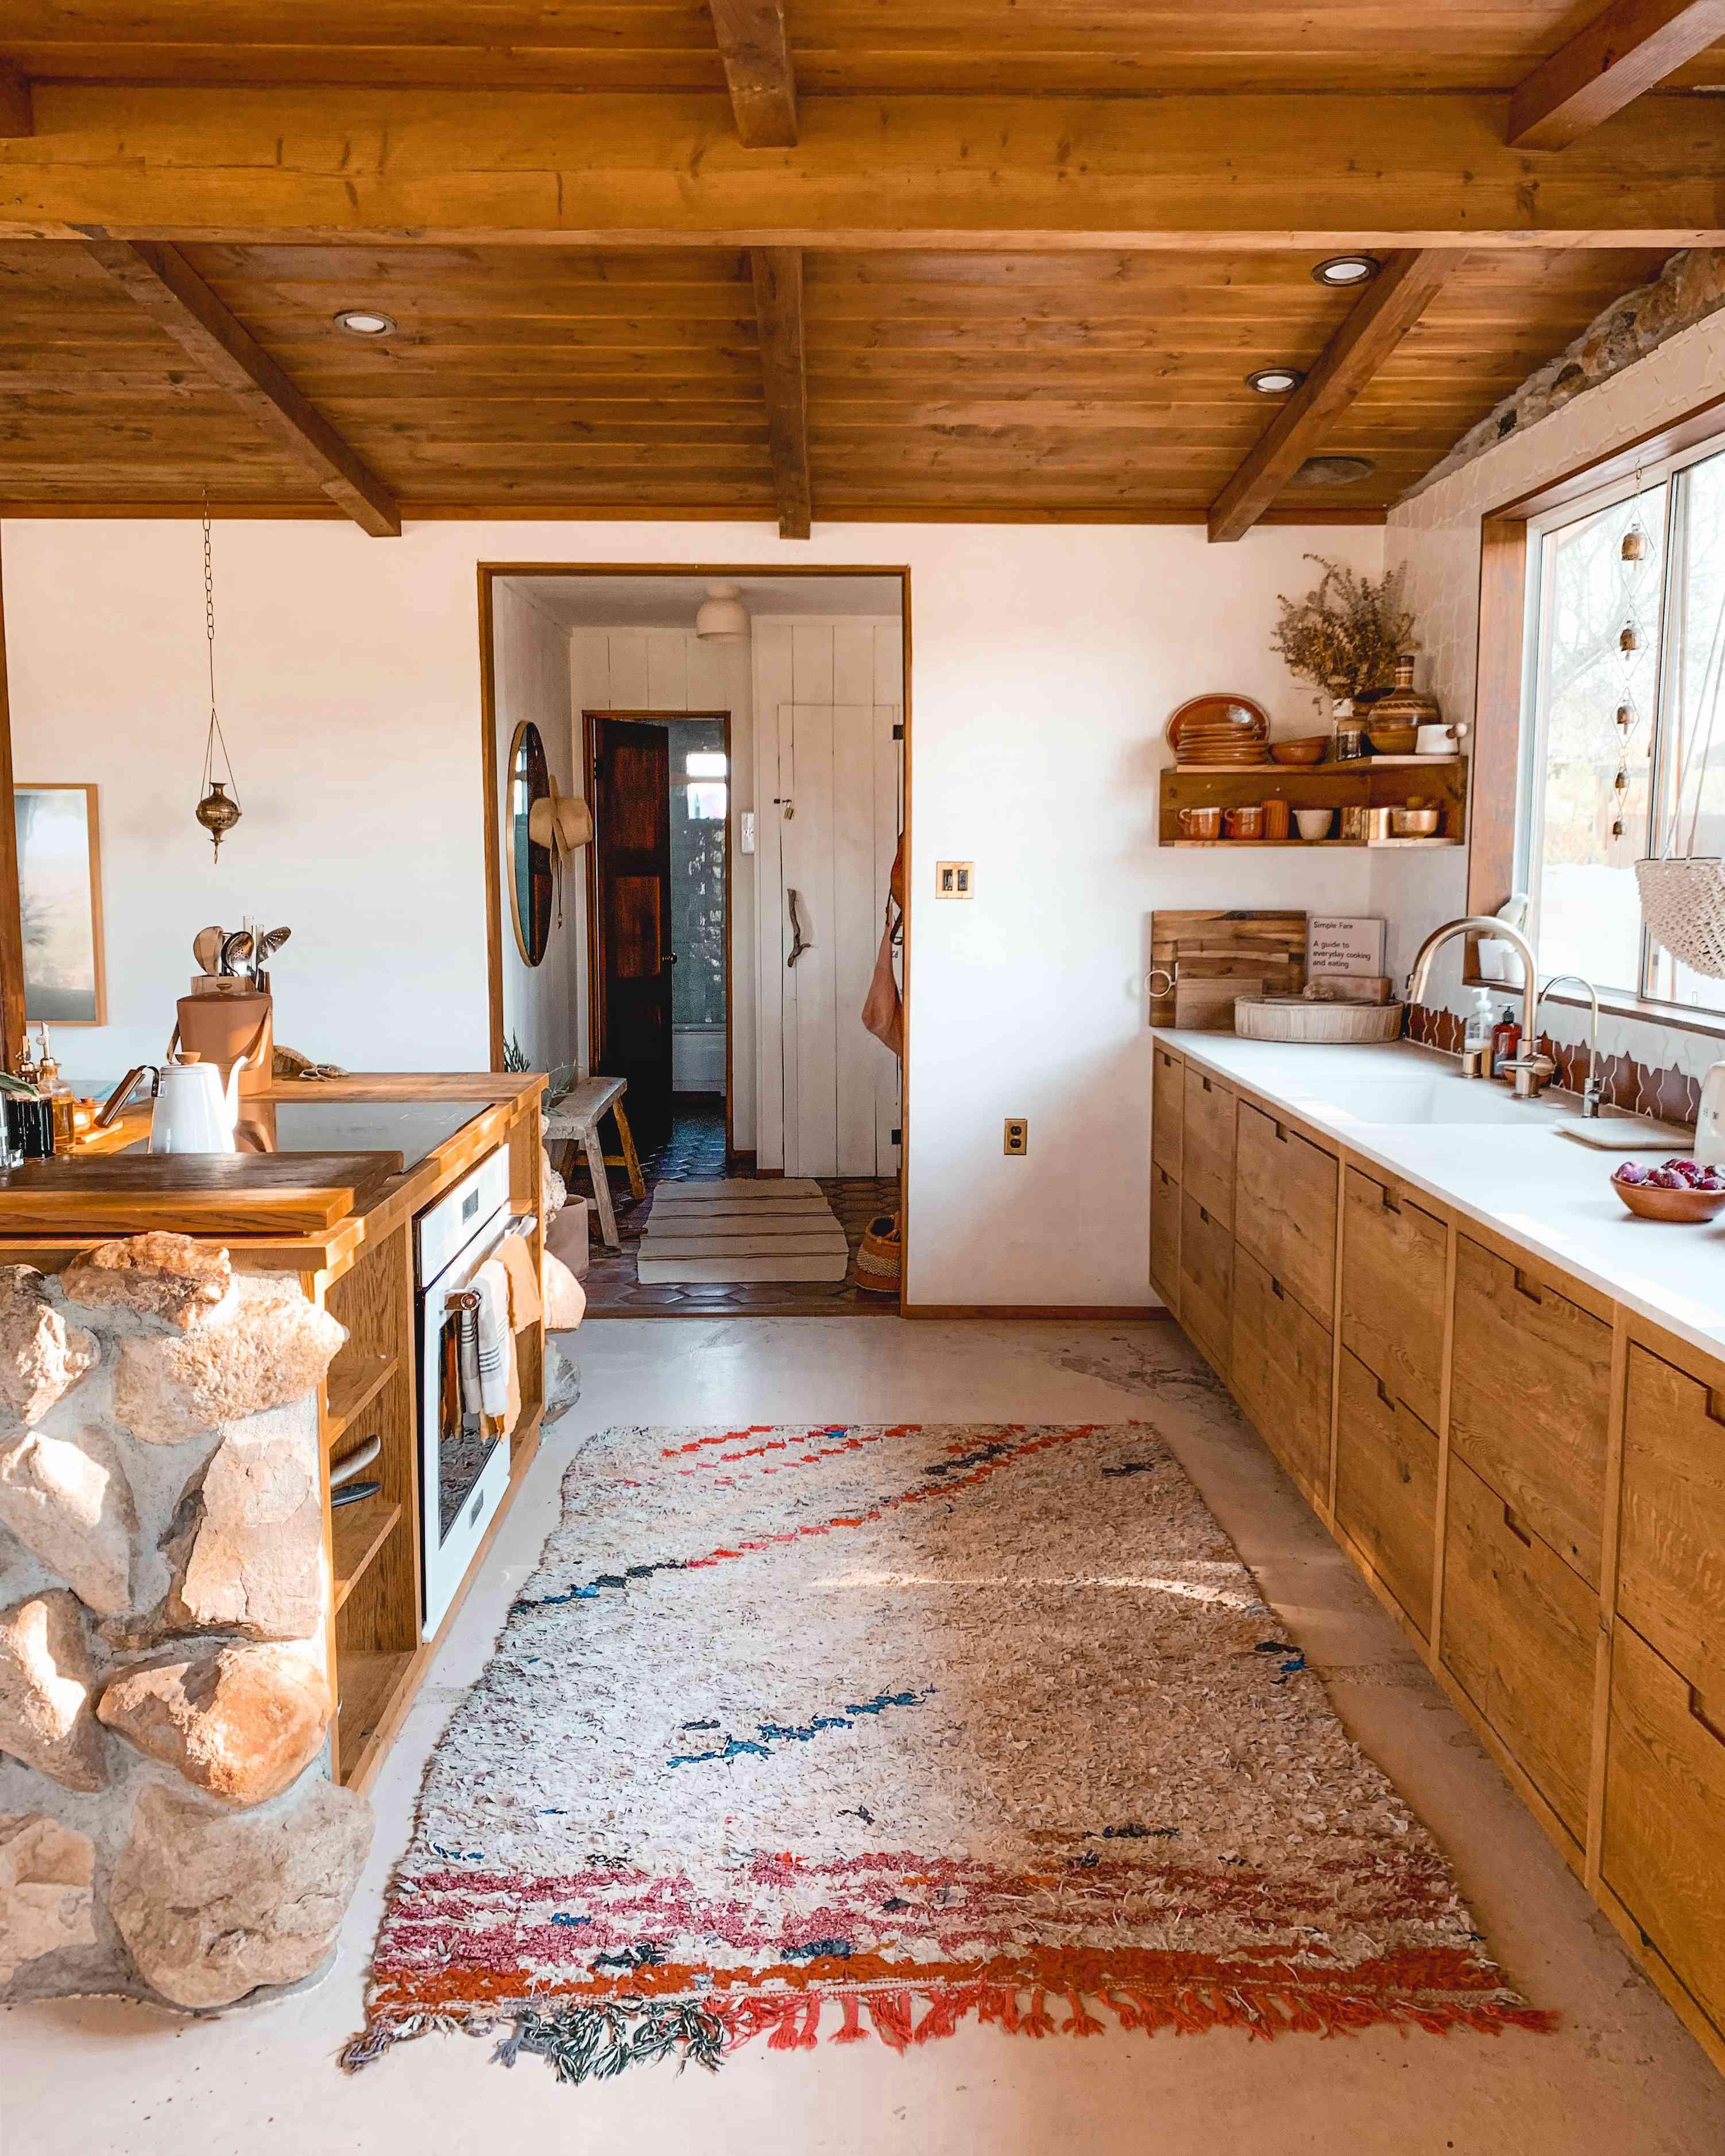 The Kitchen at The Joshua Tree House